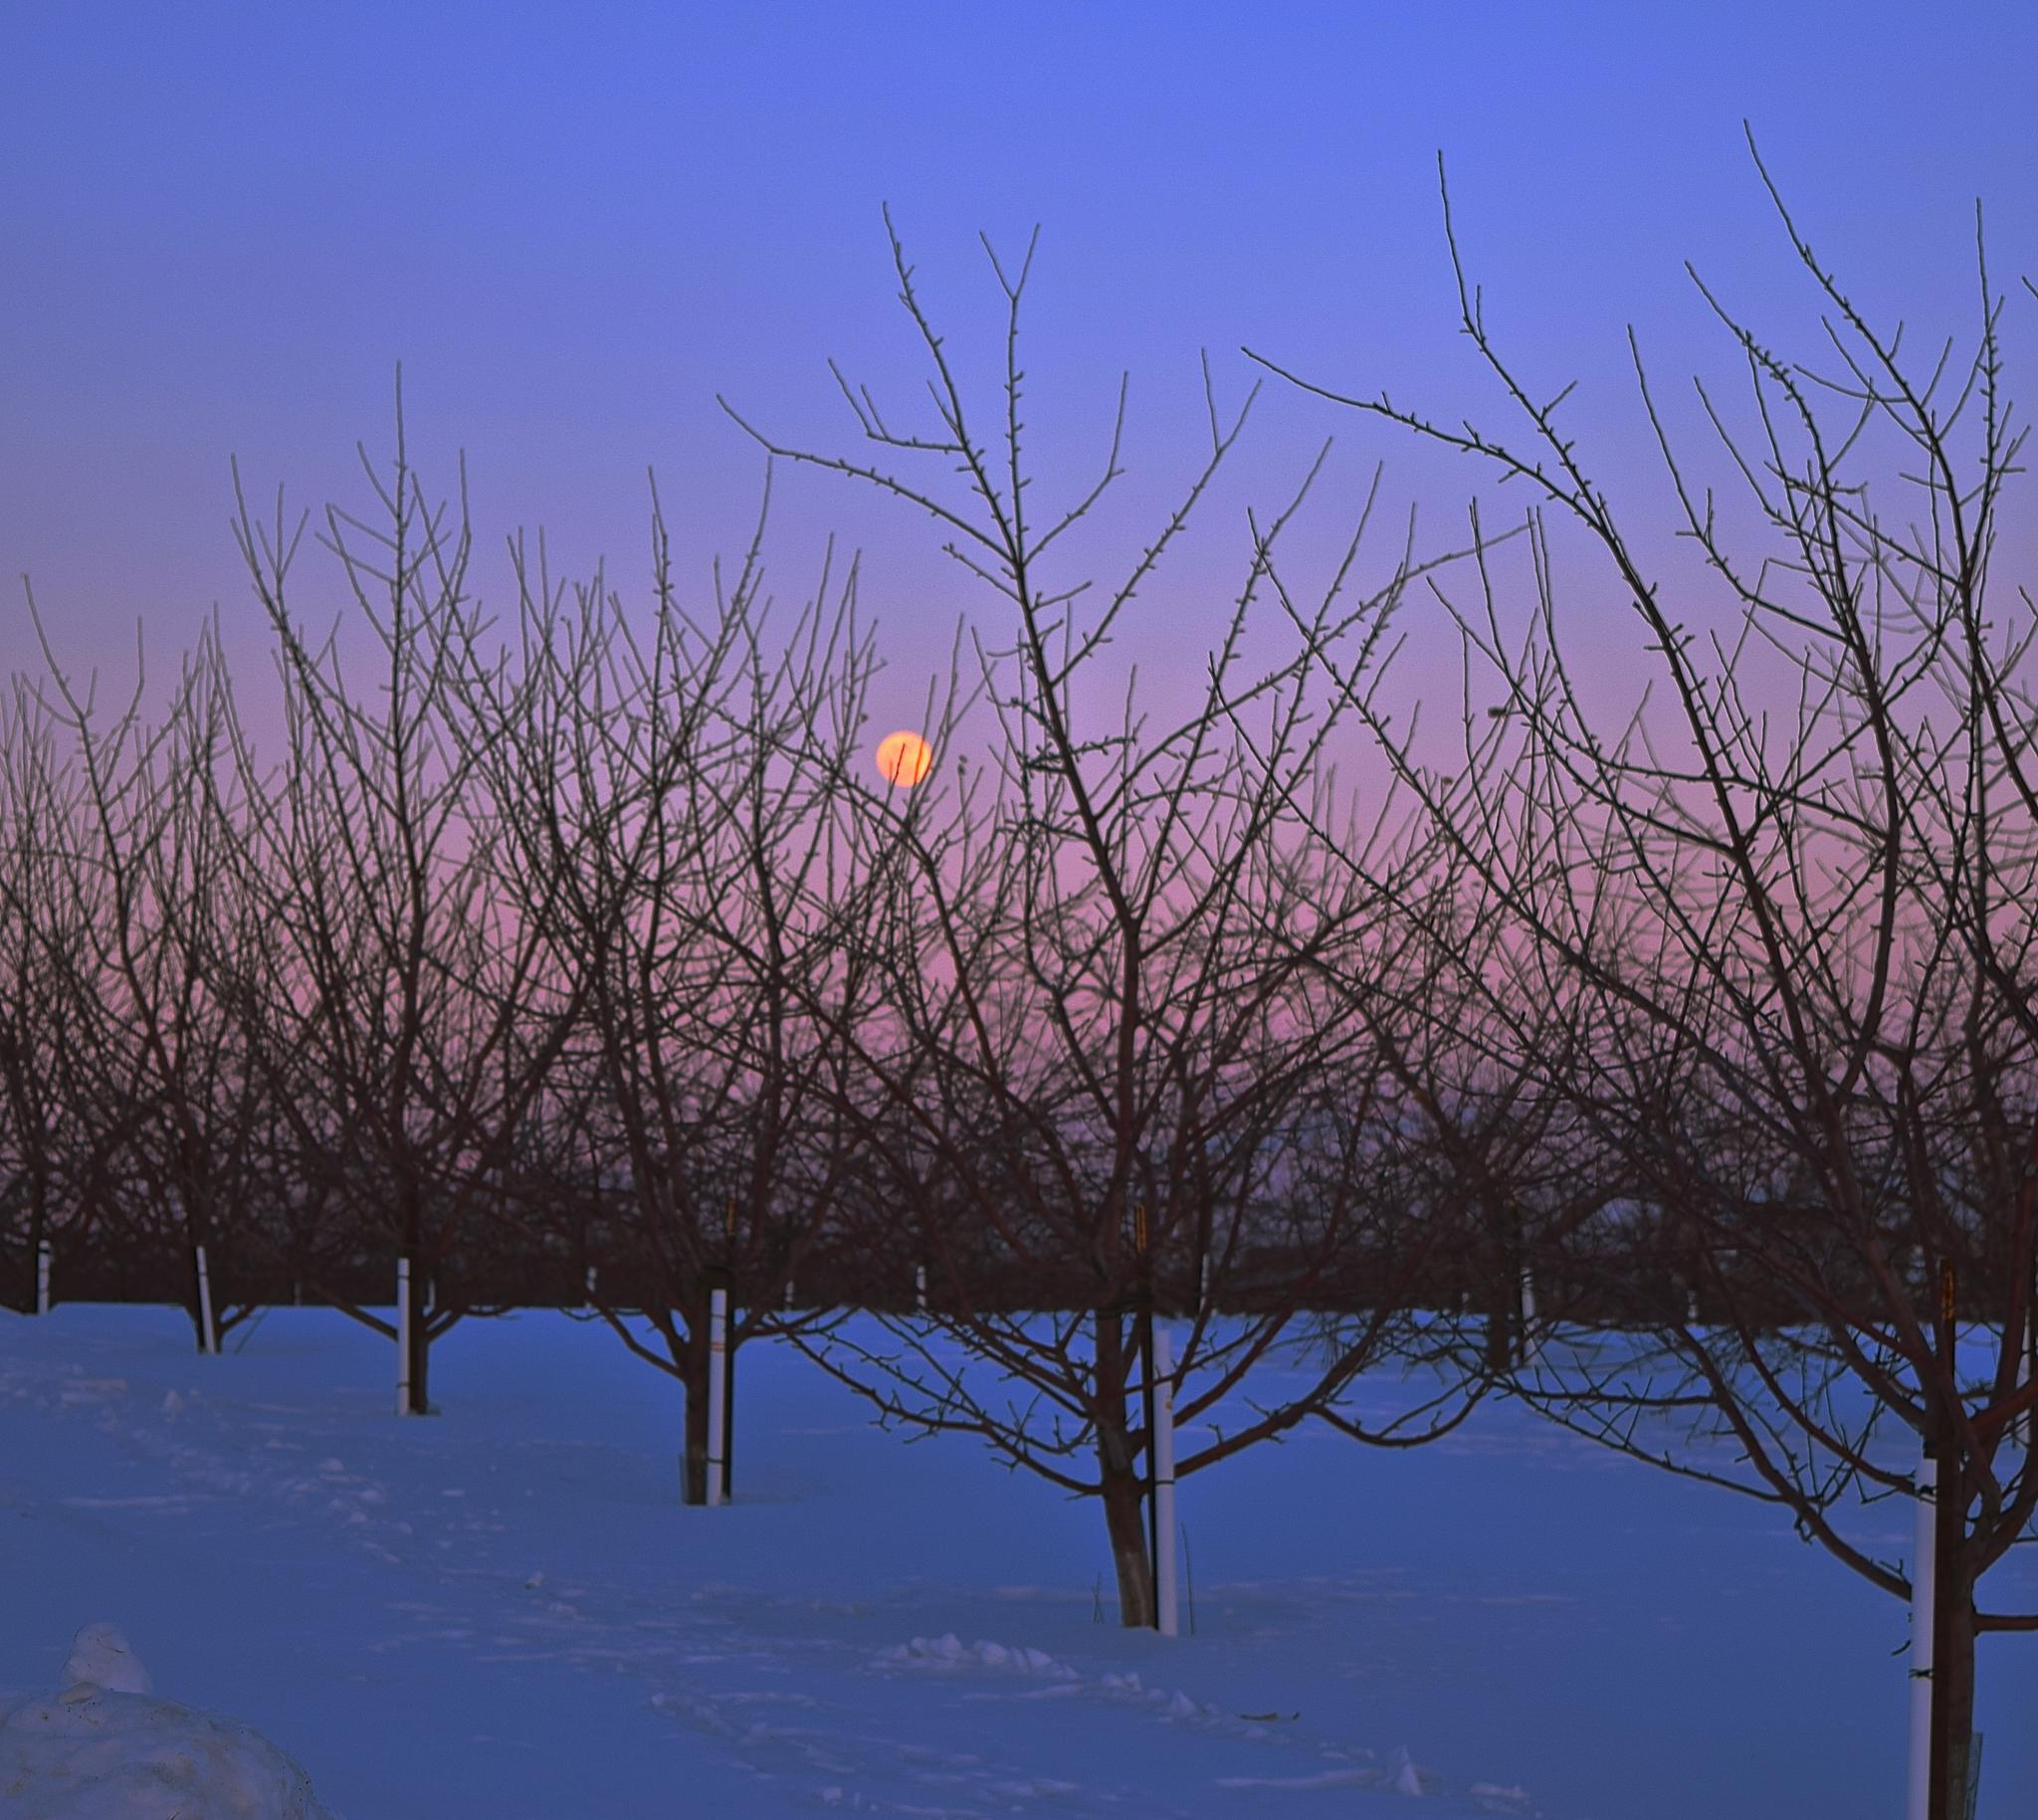 Orchard Moon by vonda.lavway